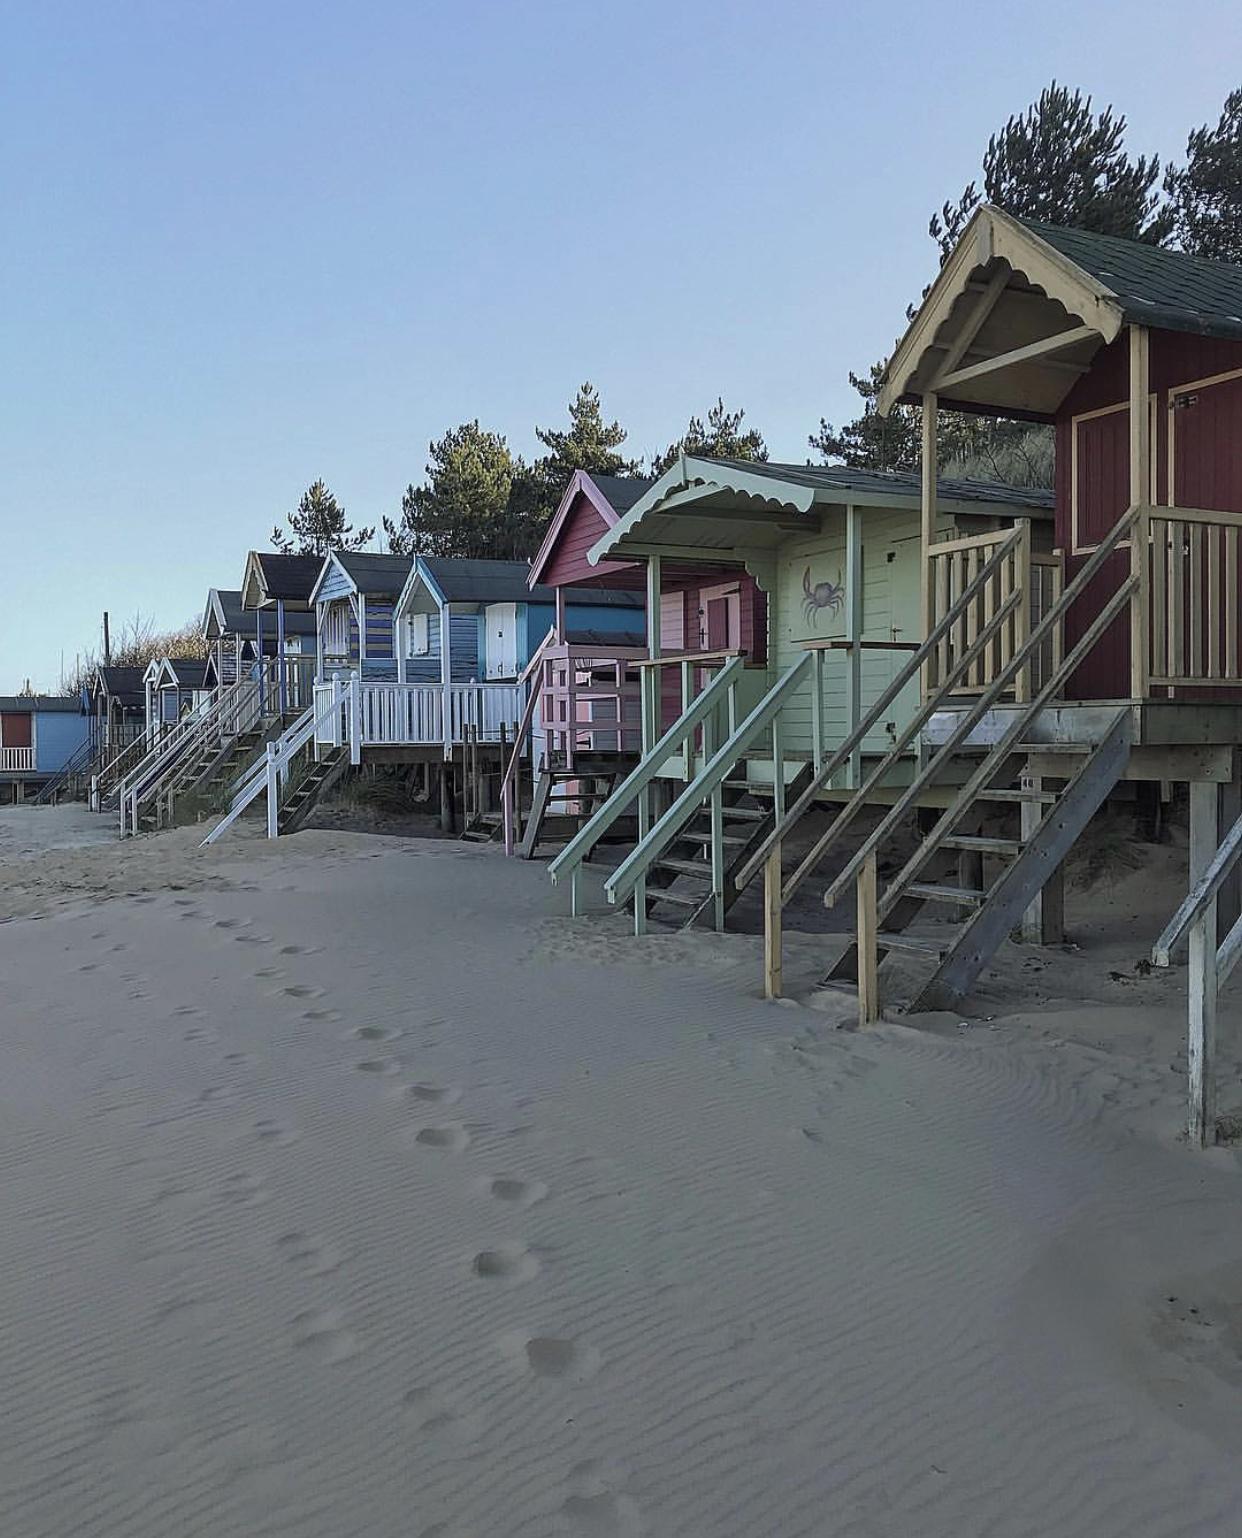 beach huts.jpeg